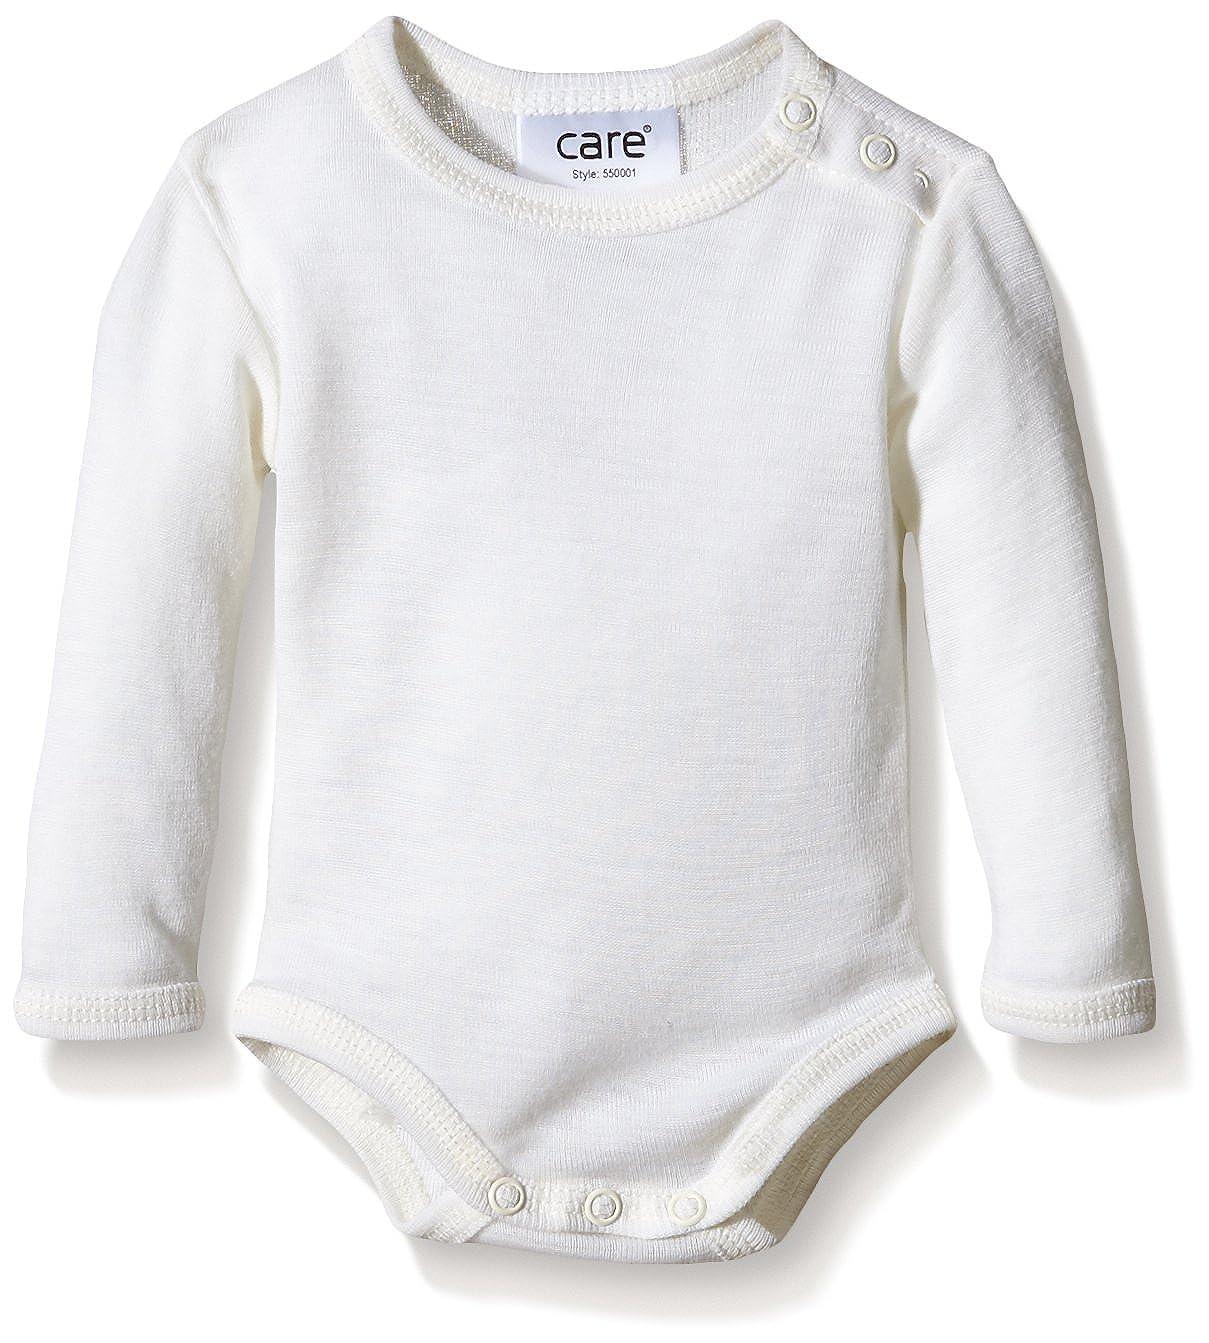 Care Body Unisex - Bimbi 0-24 Avorio (Offwhite 200) 550001